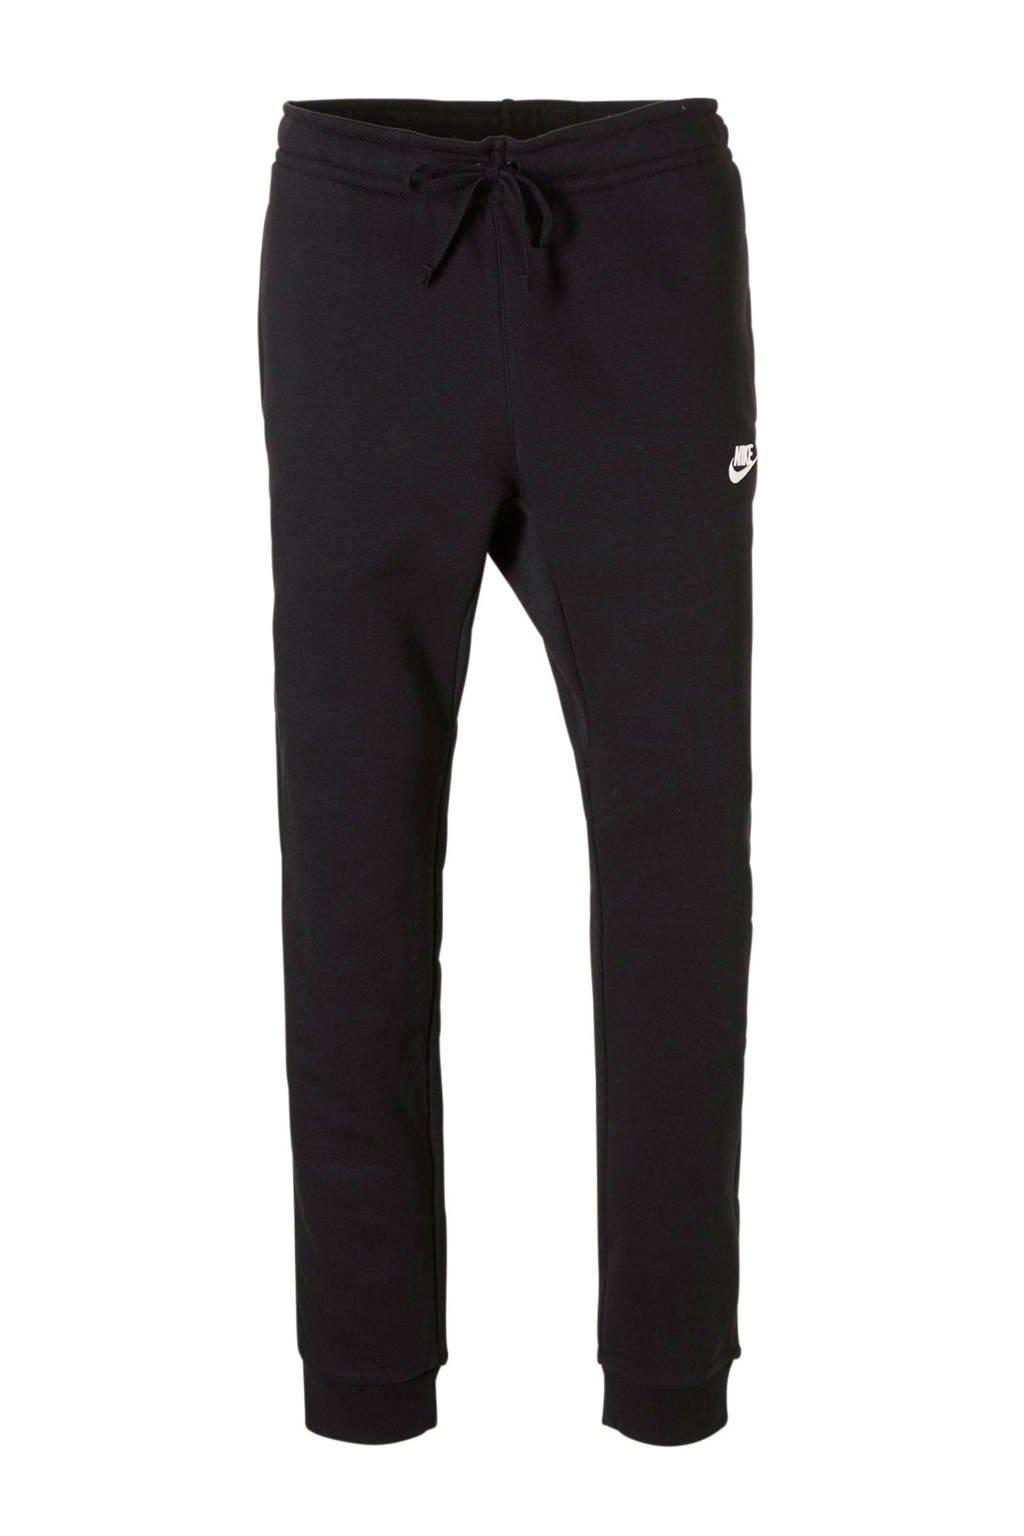 Nike   broek zwart, Zwart